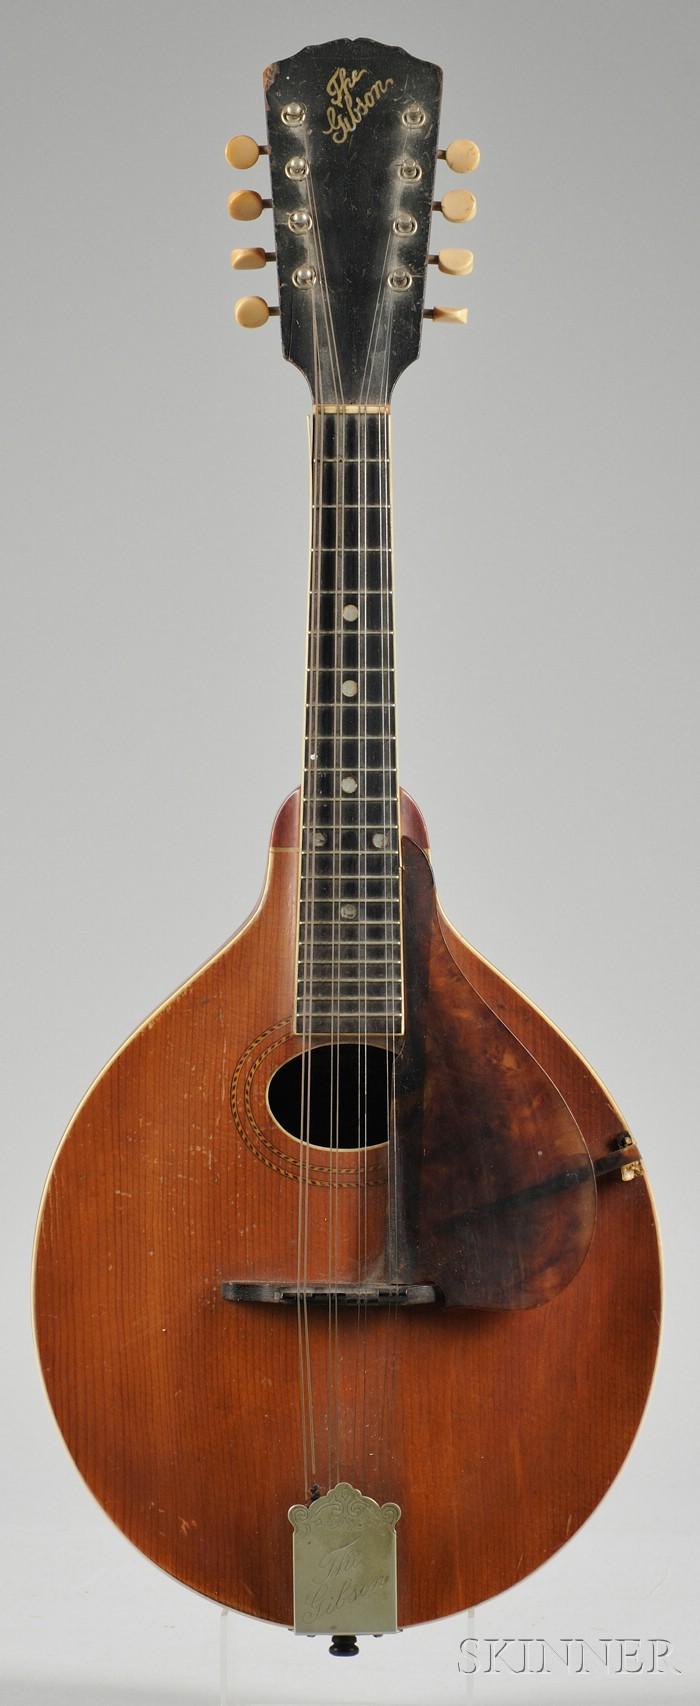 American Mandolin, Gibson Mandolin-Guitar Company, Kalamazoo, c. 1915, Style A1